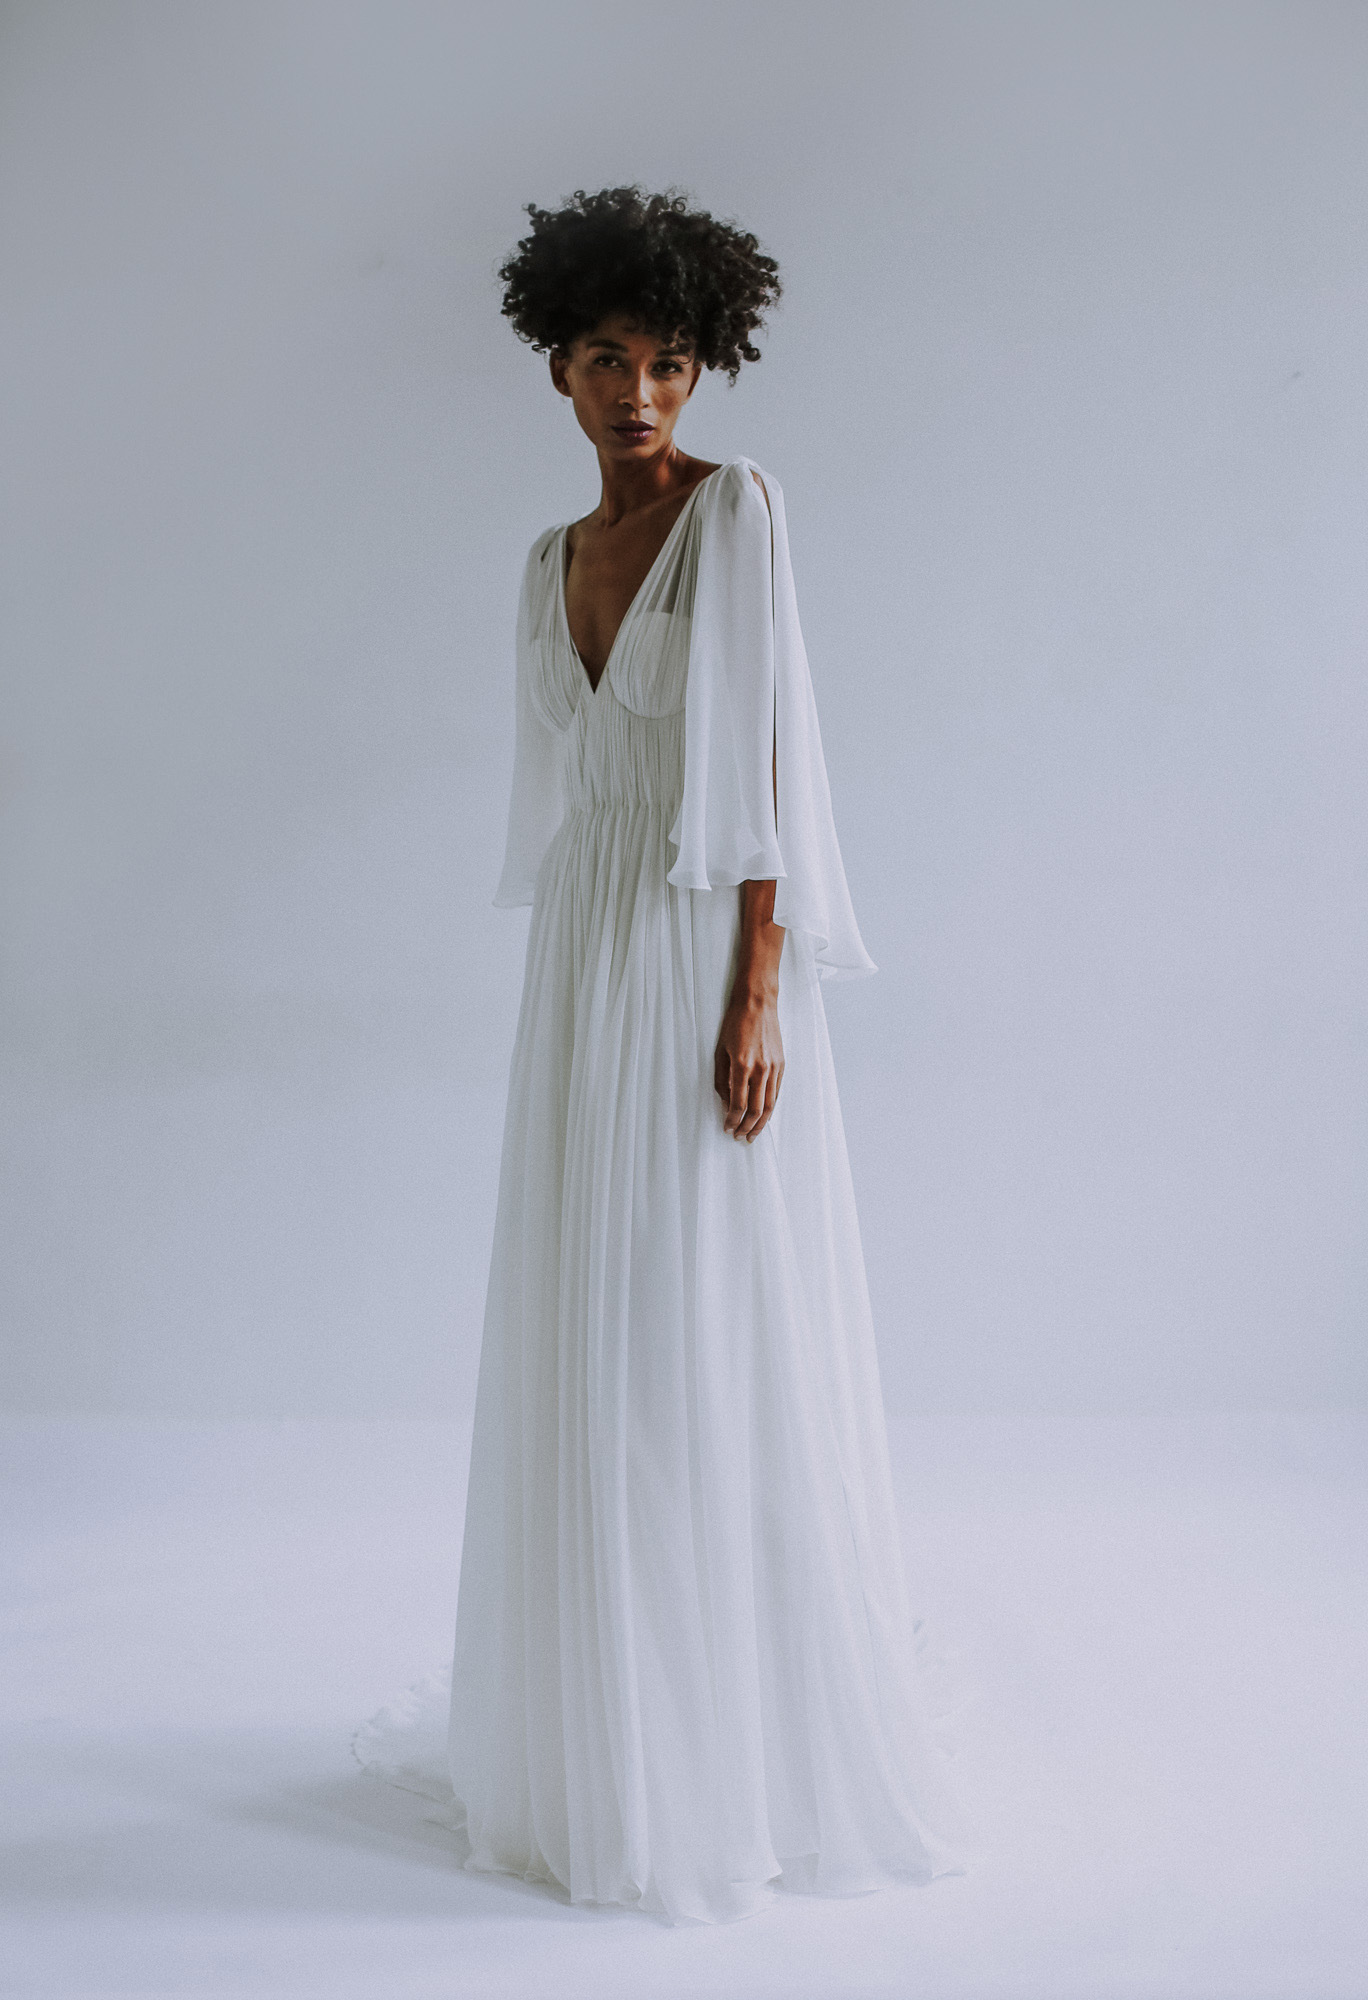 leanne-marshall-wedding-gown-9.jpg